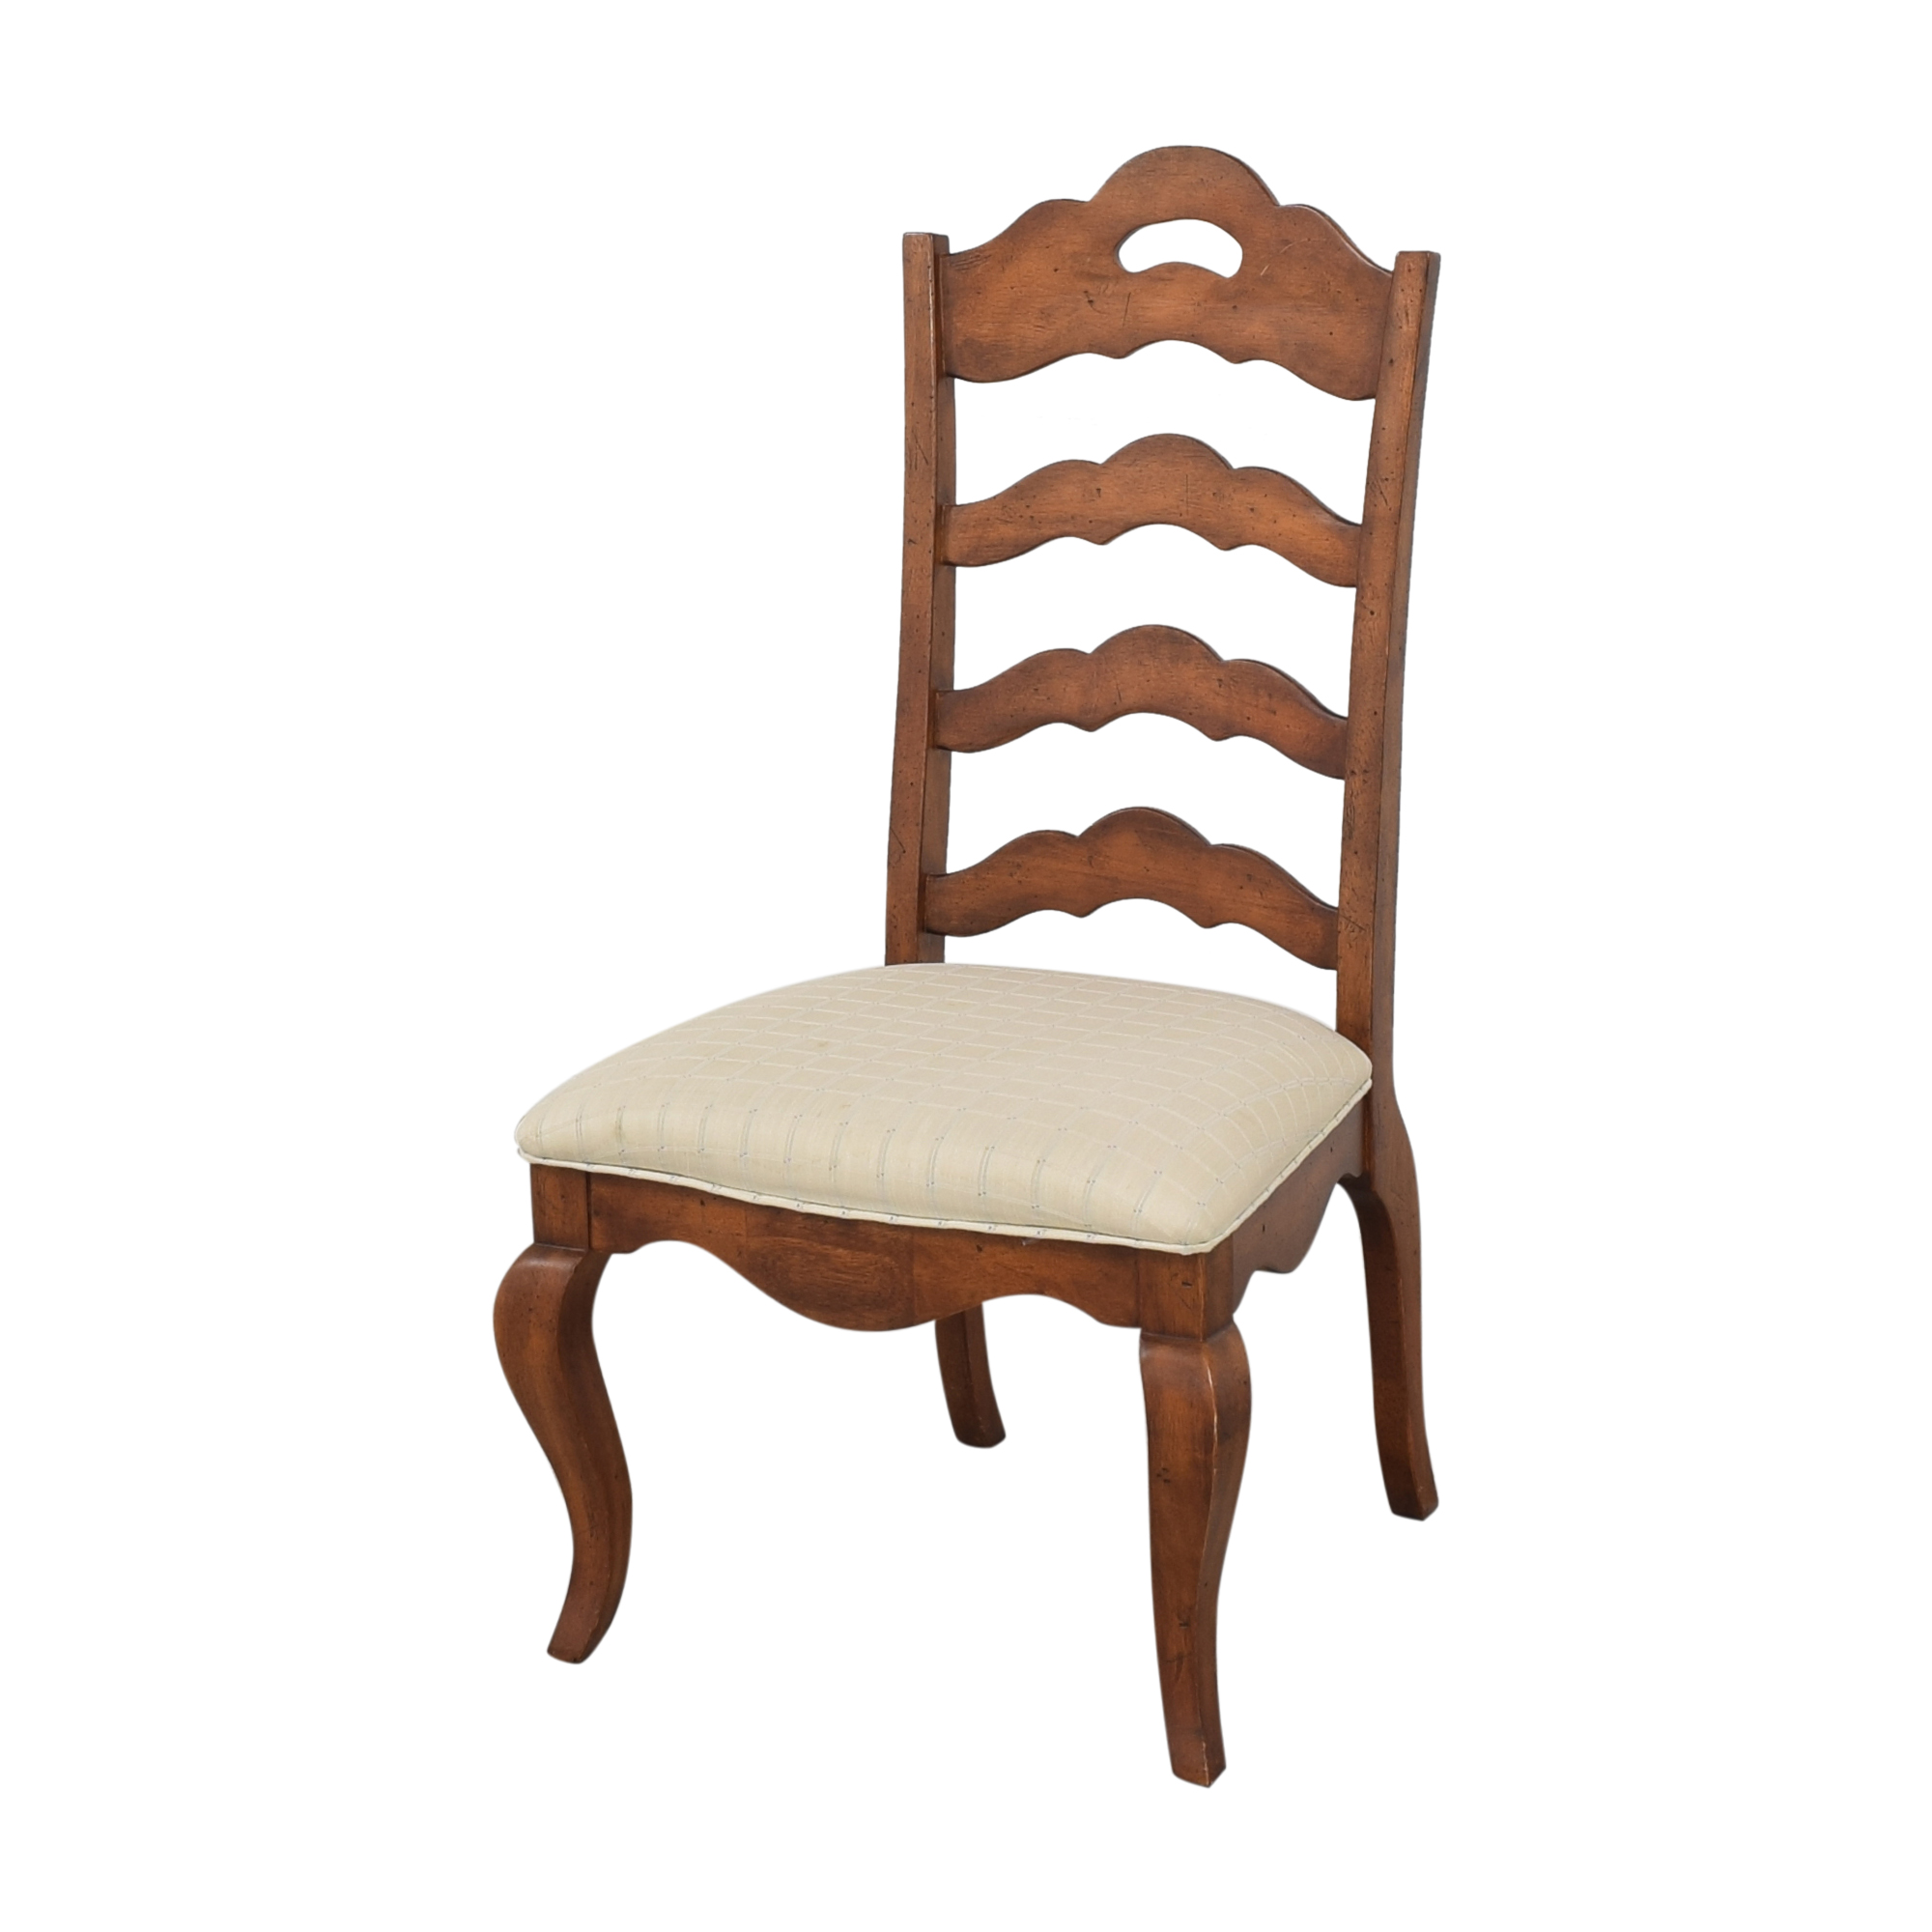 Universal Furniture Universal Furniture Ladder Back Dining Chairs coupon